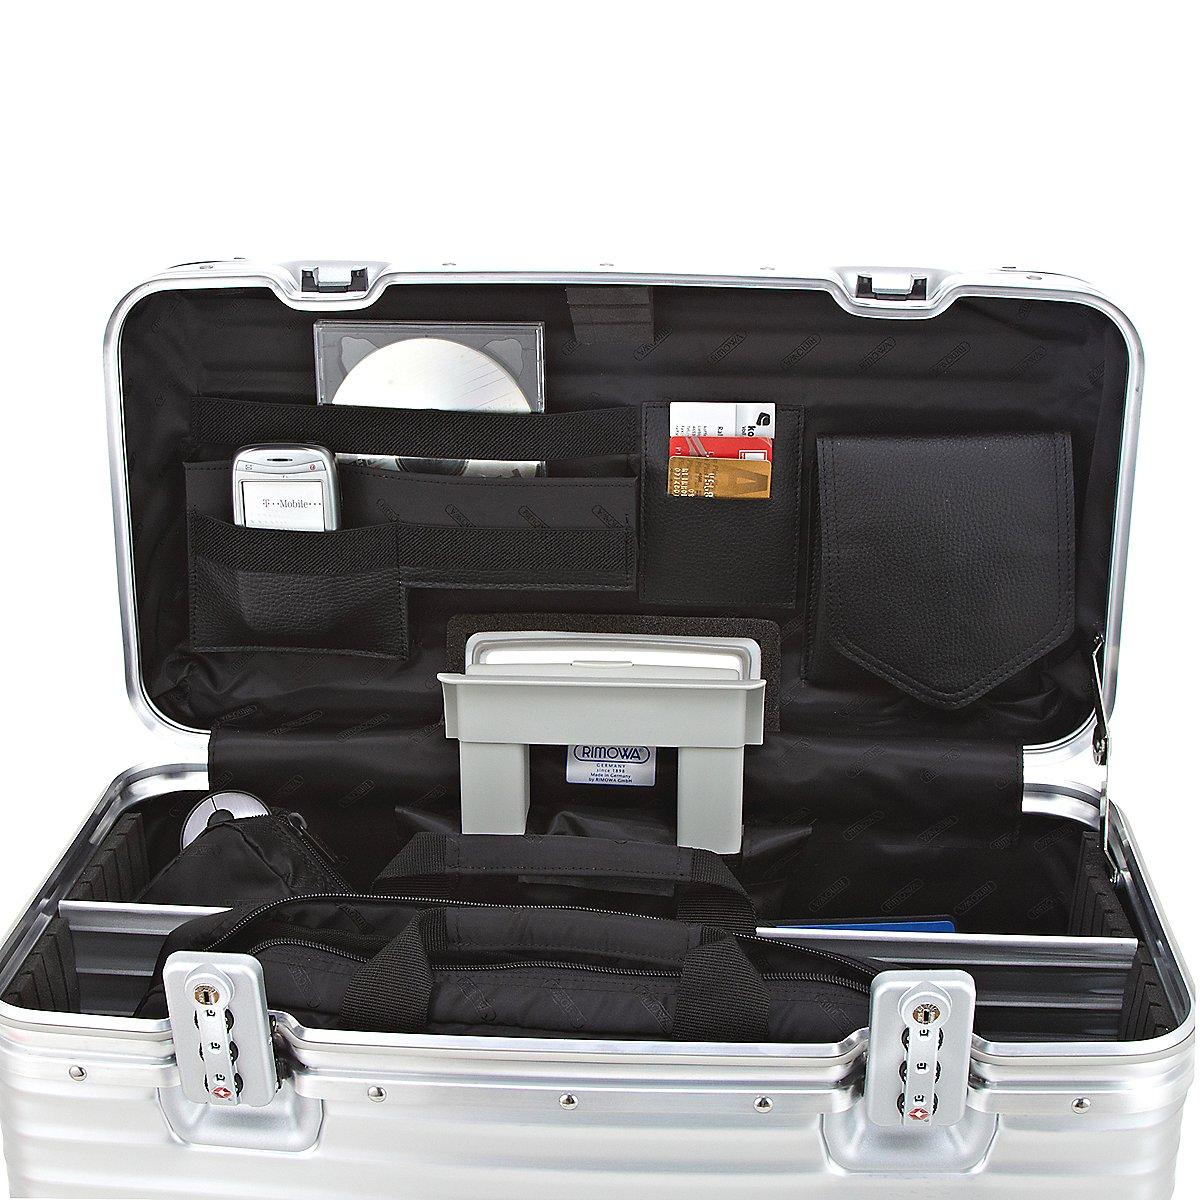 rimowa pilot piloten multiwheel trolley 52 cm koffer. Black Bedroom Furniture Sets. Home Design Ideas